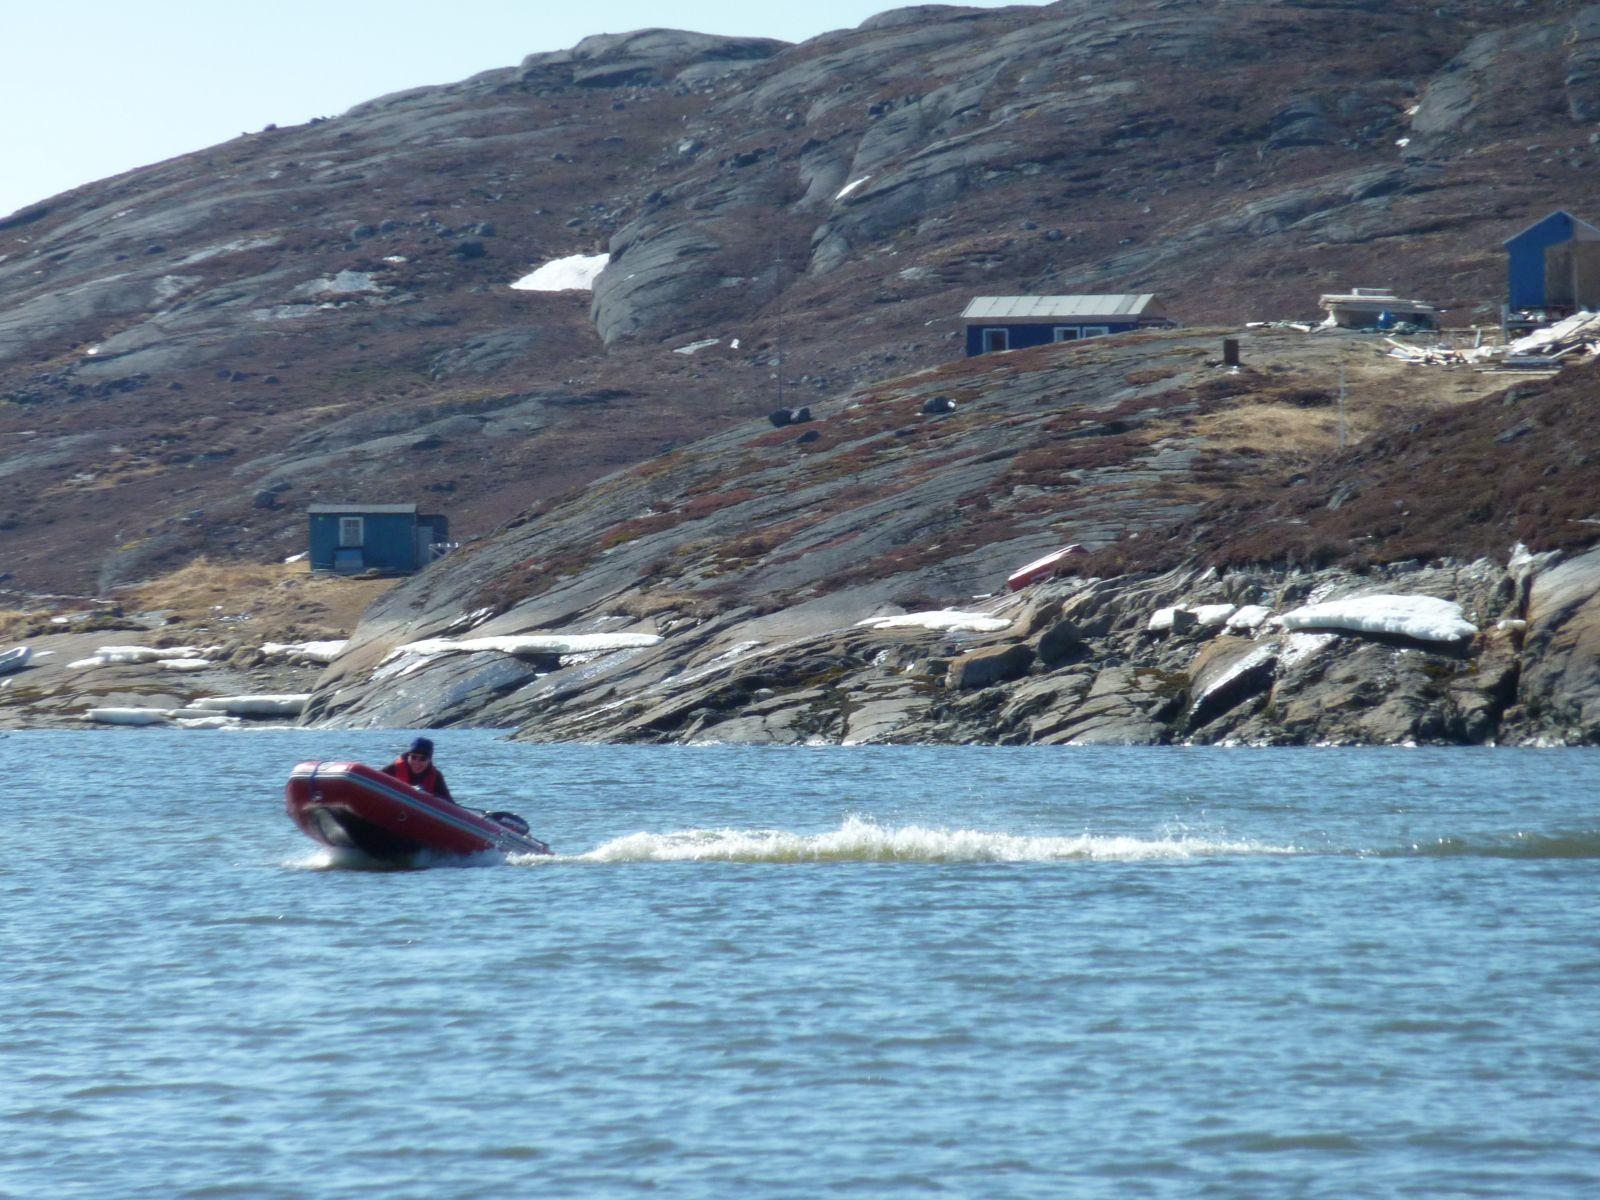 2010-05-13-1536_Jesper tager 1. tur med gummibåden alene_Gummibåd; Jesper Eugenius Labansen; Jesper Labansen; Maritha Eugenius Labansen; Nuuk; Panorama; Saa